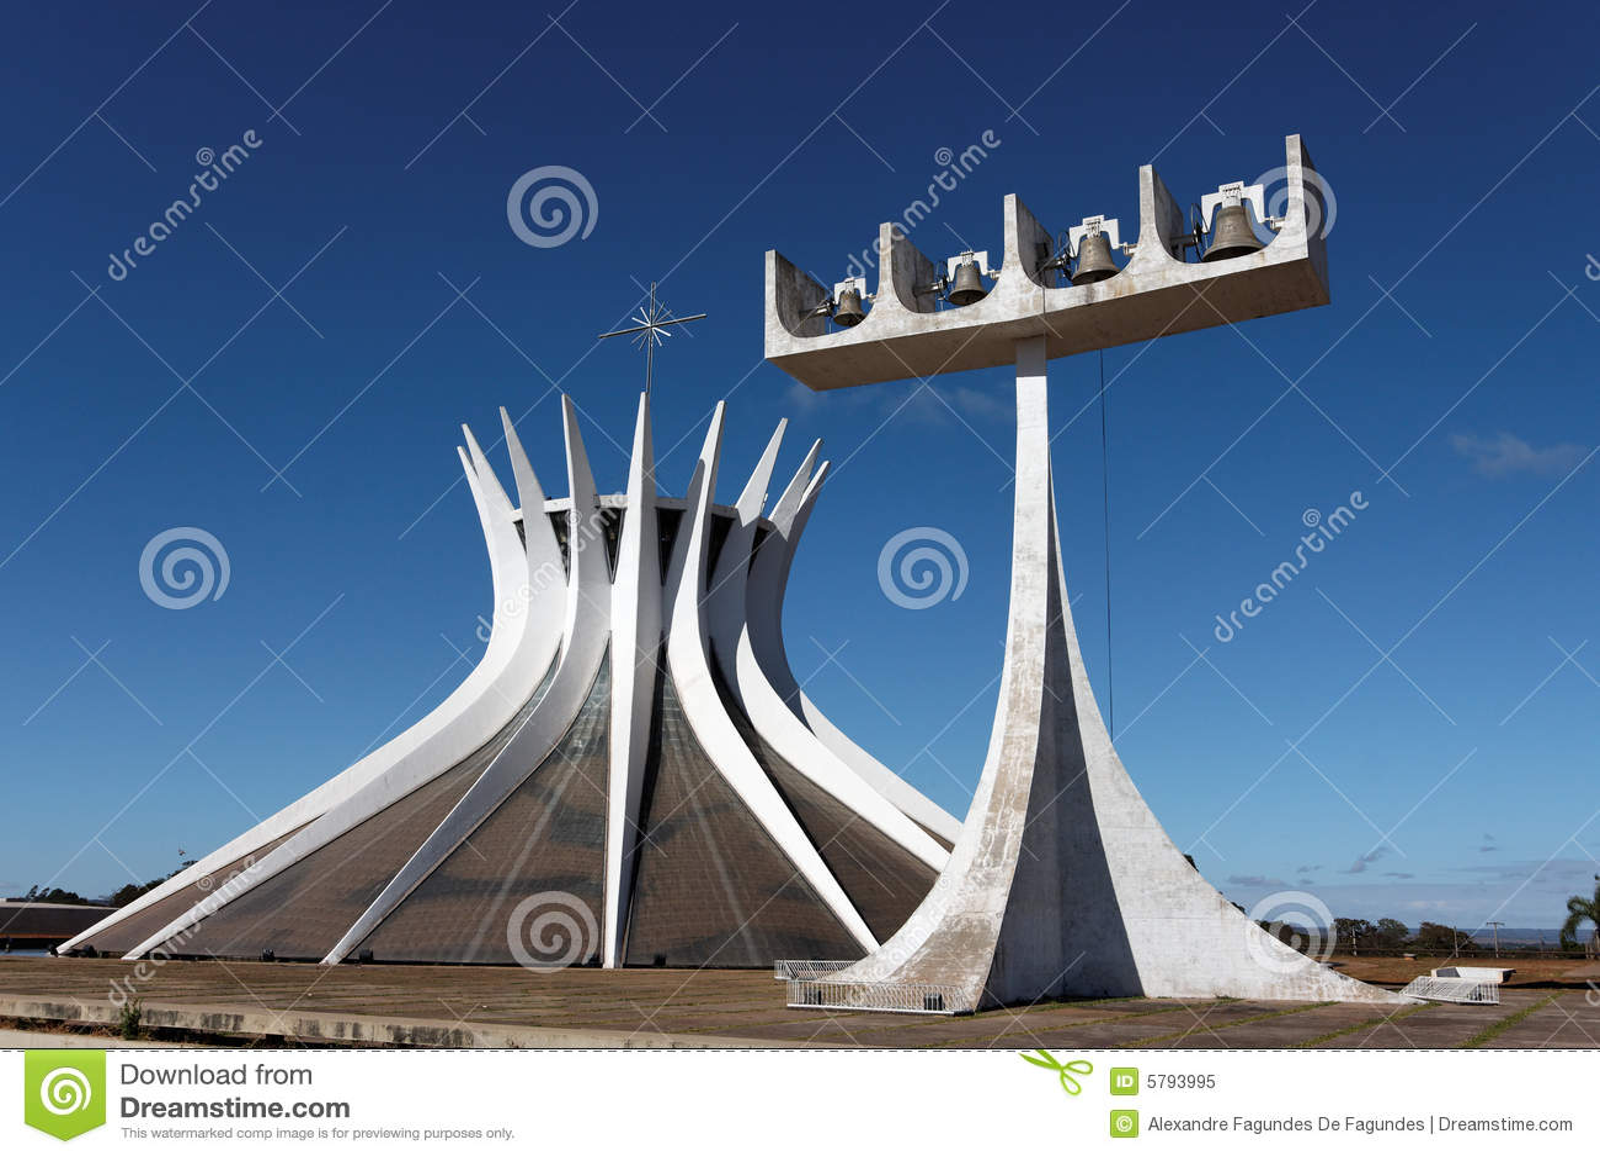 brasilien kathedrale stockbild bild von glocke ernstlich 5793995. Black Bedroom Furniture Sets. Home Design Ideas